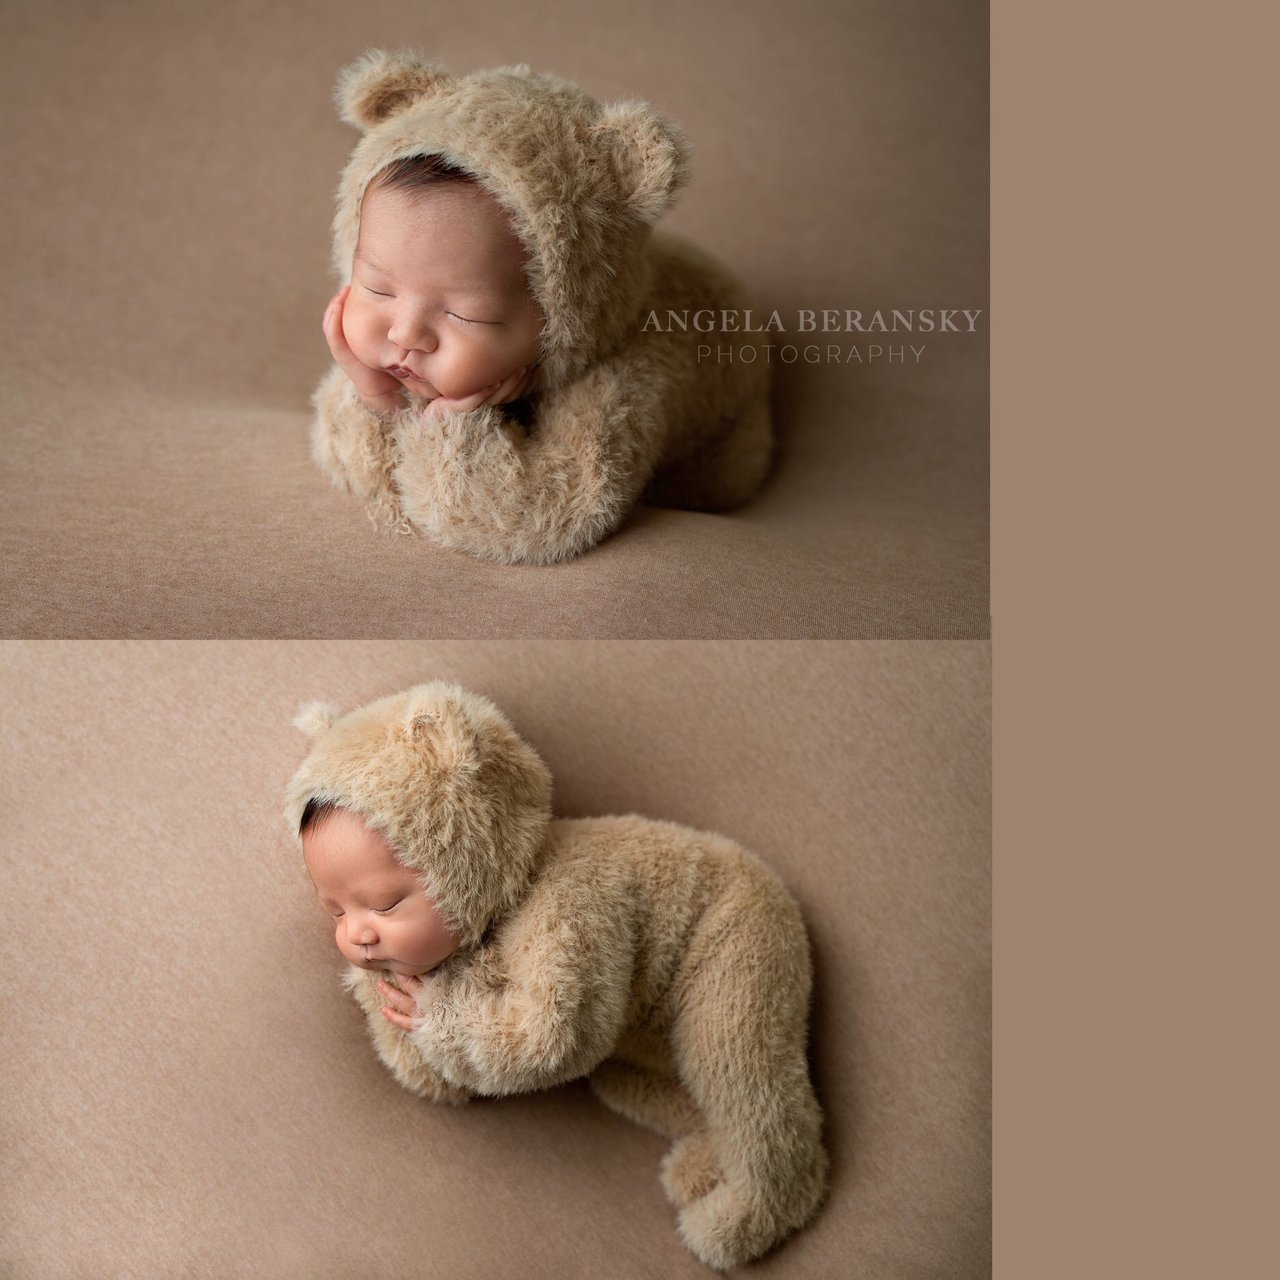 Fine art newborn photography photo 0E97A7E2-5B7F-4CE1-8687-1274257467CA.jpg